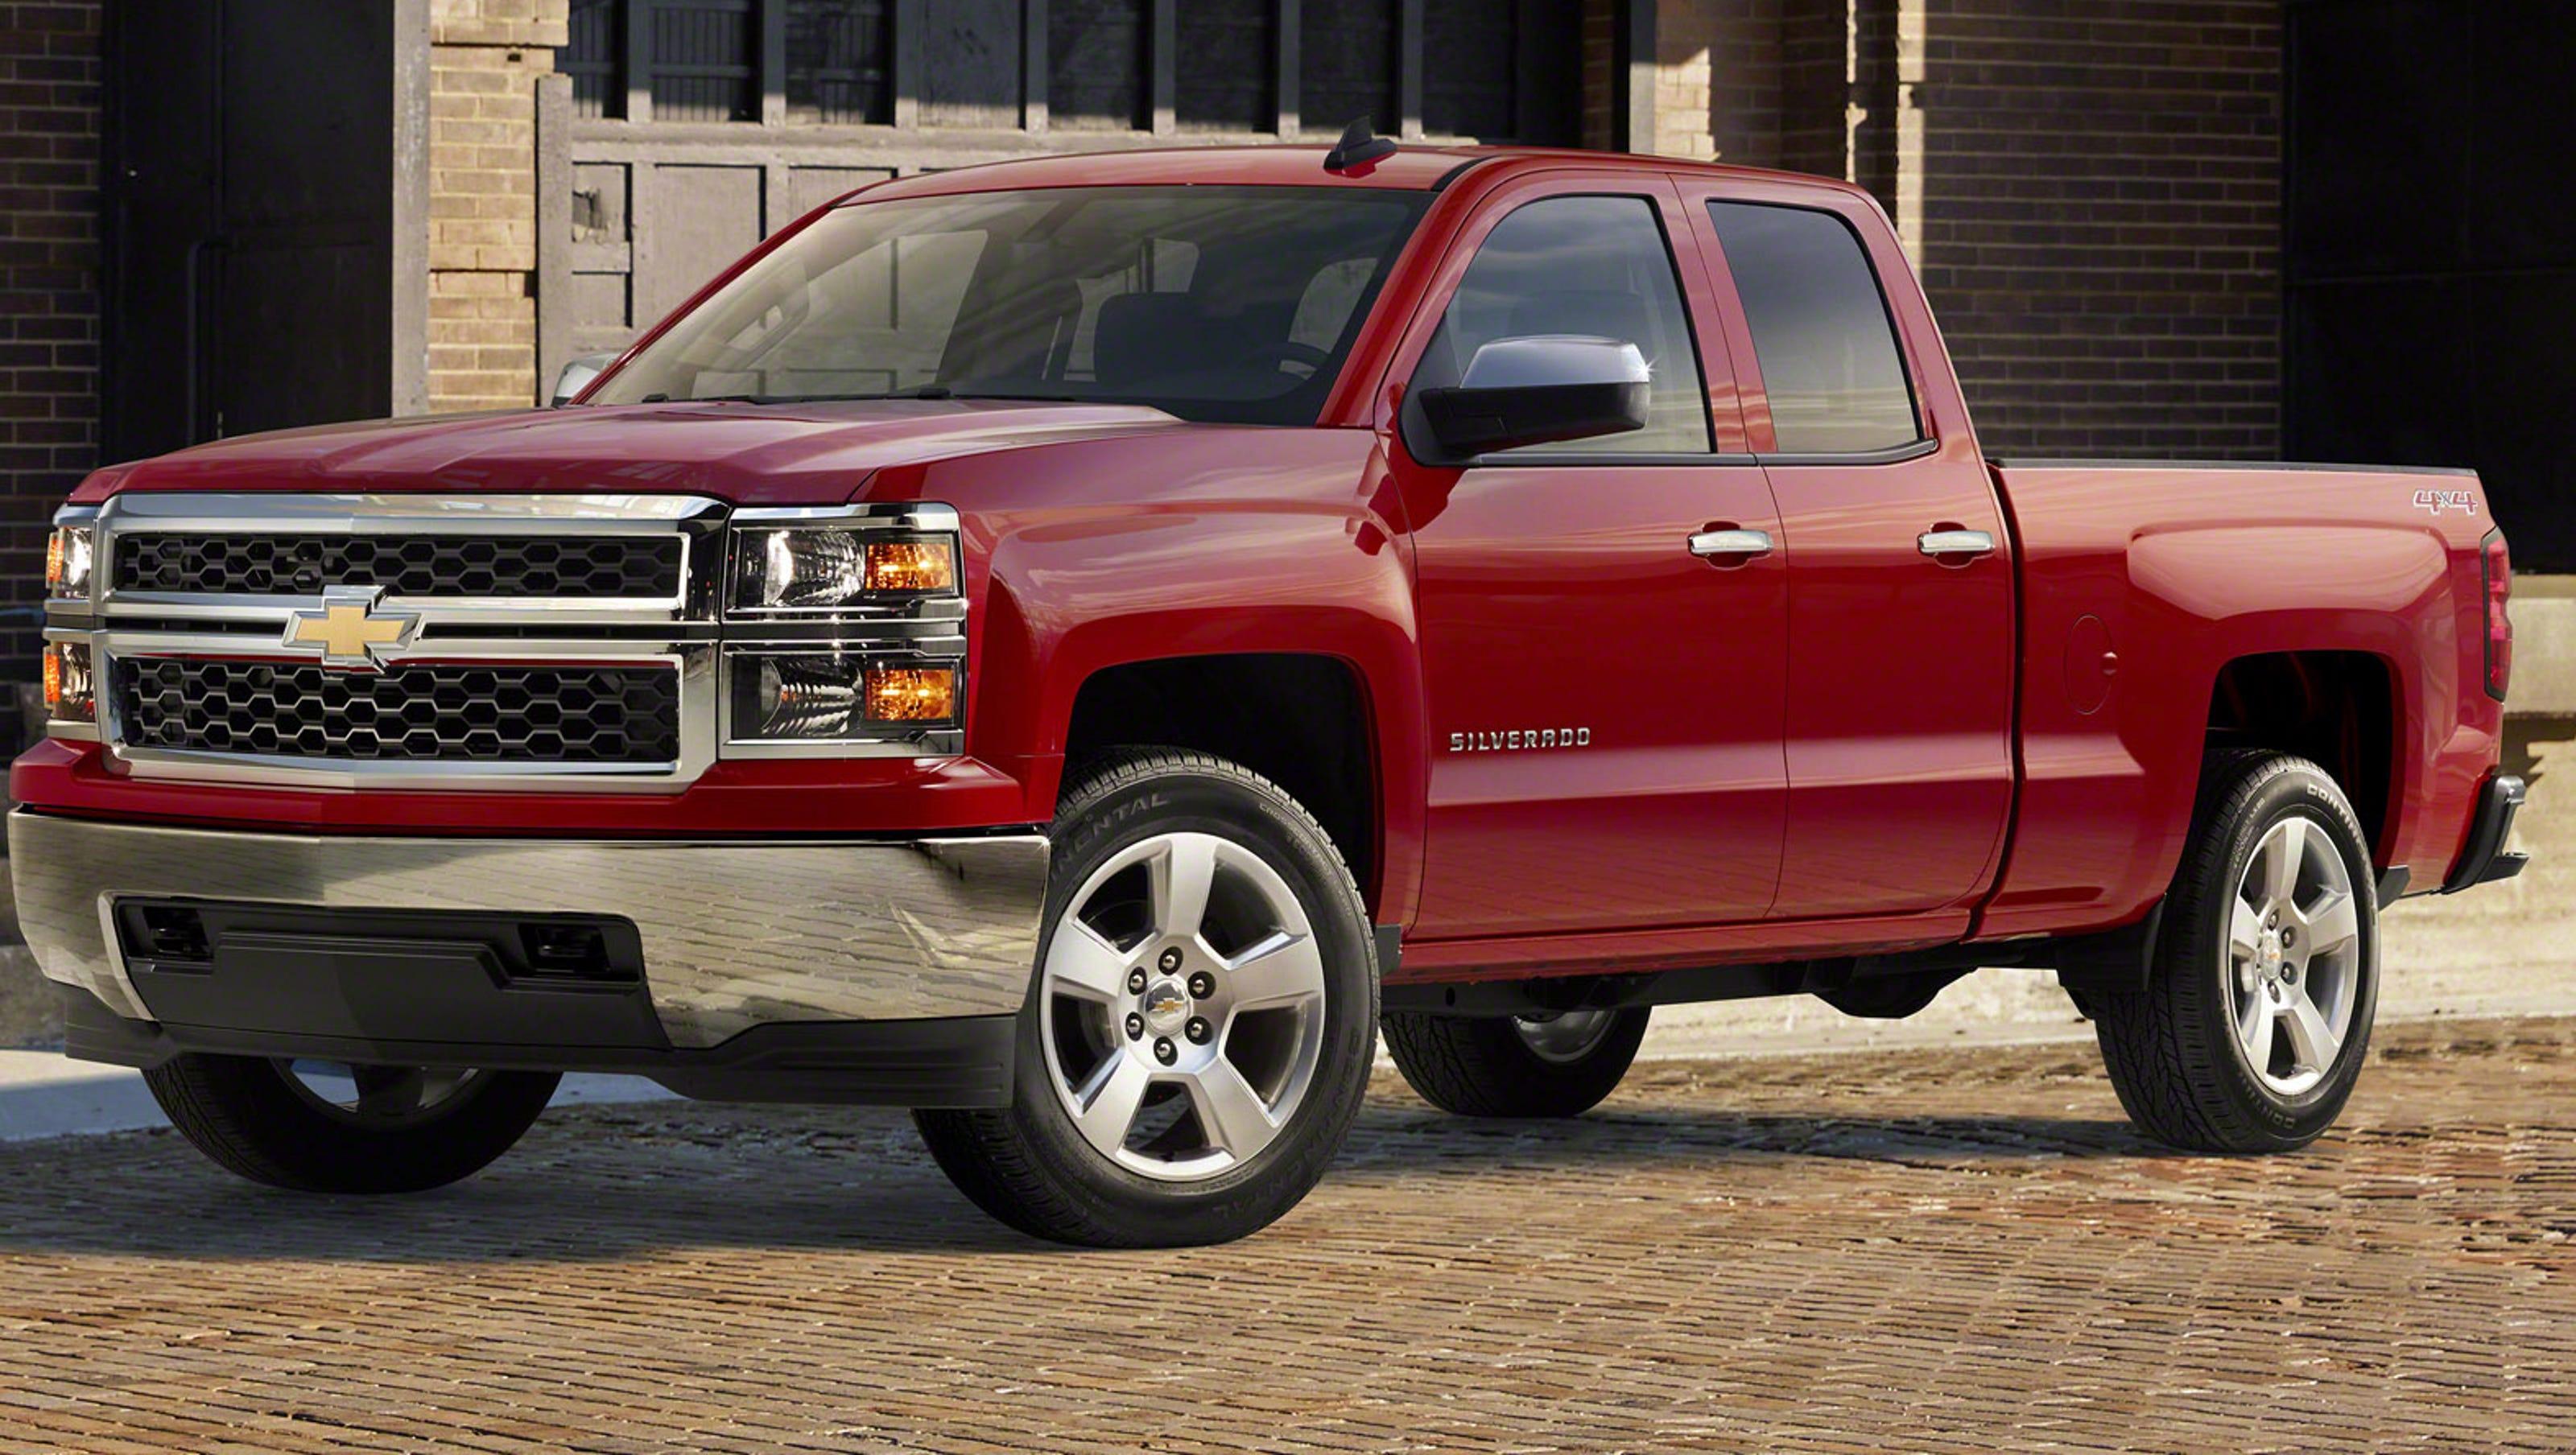 GM recalls 1 million pickup trucks, SUVs over steering defect